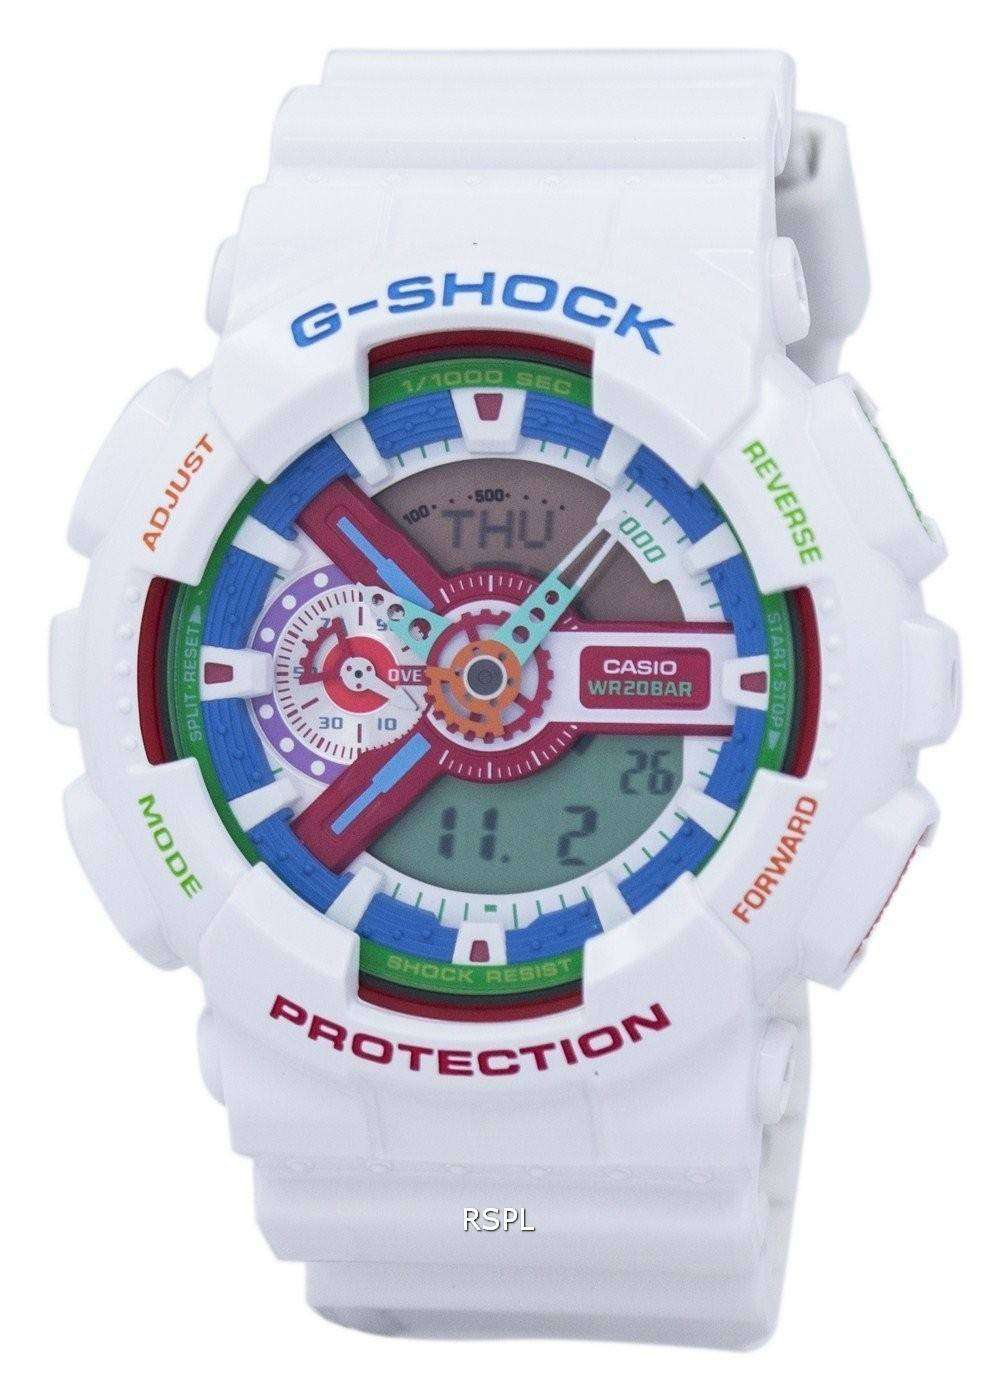 casio g shock shock resistant analog digital 200m ga 110mc 7a men 39 s watch downunderwatches. Black Bedroom Furniture Sets. Home Design Ideas